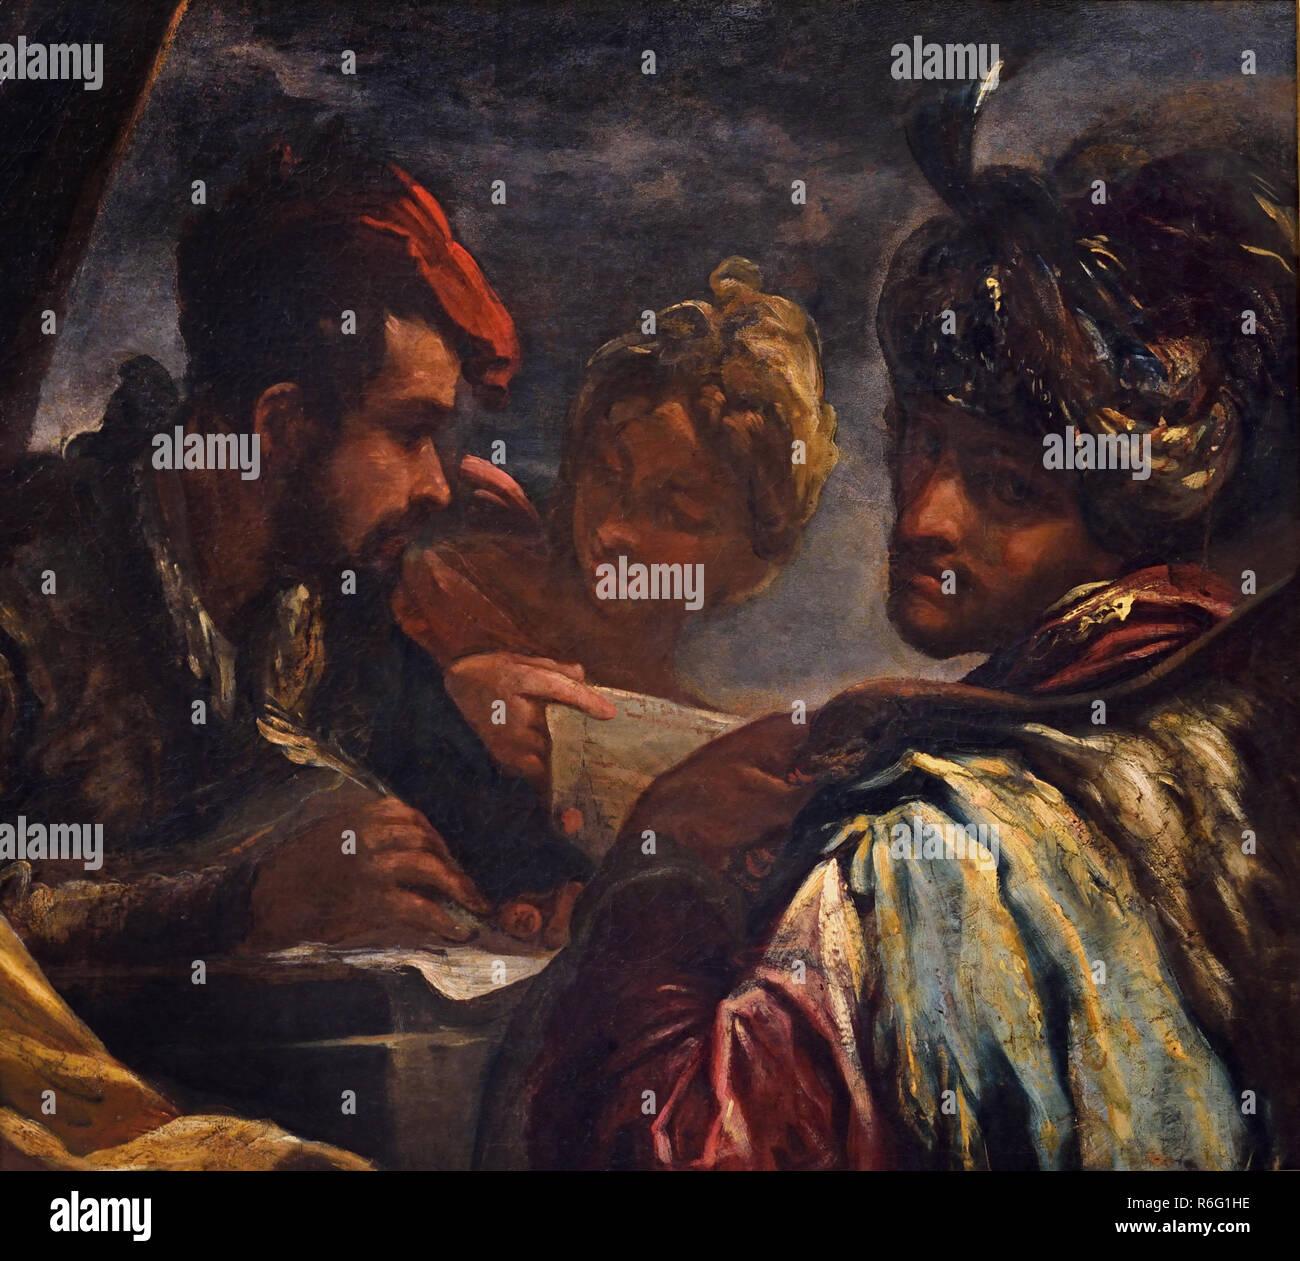 Genre scene with three figures by Bernini Giovanni Antonio 1656-1727 17-18th century, Italy, Italian. - Stock Image